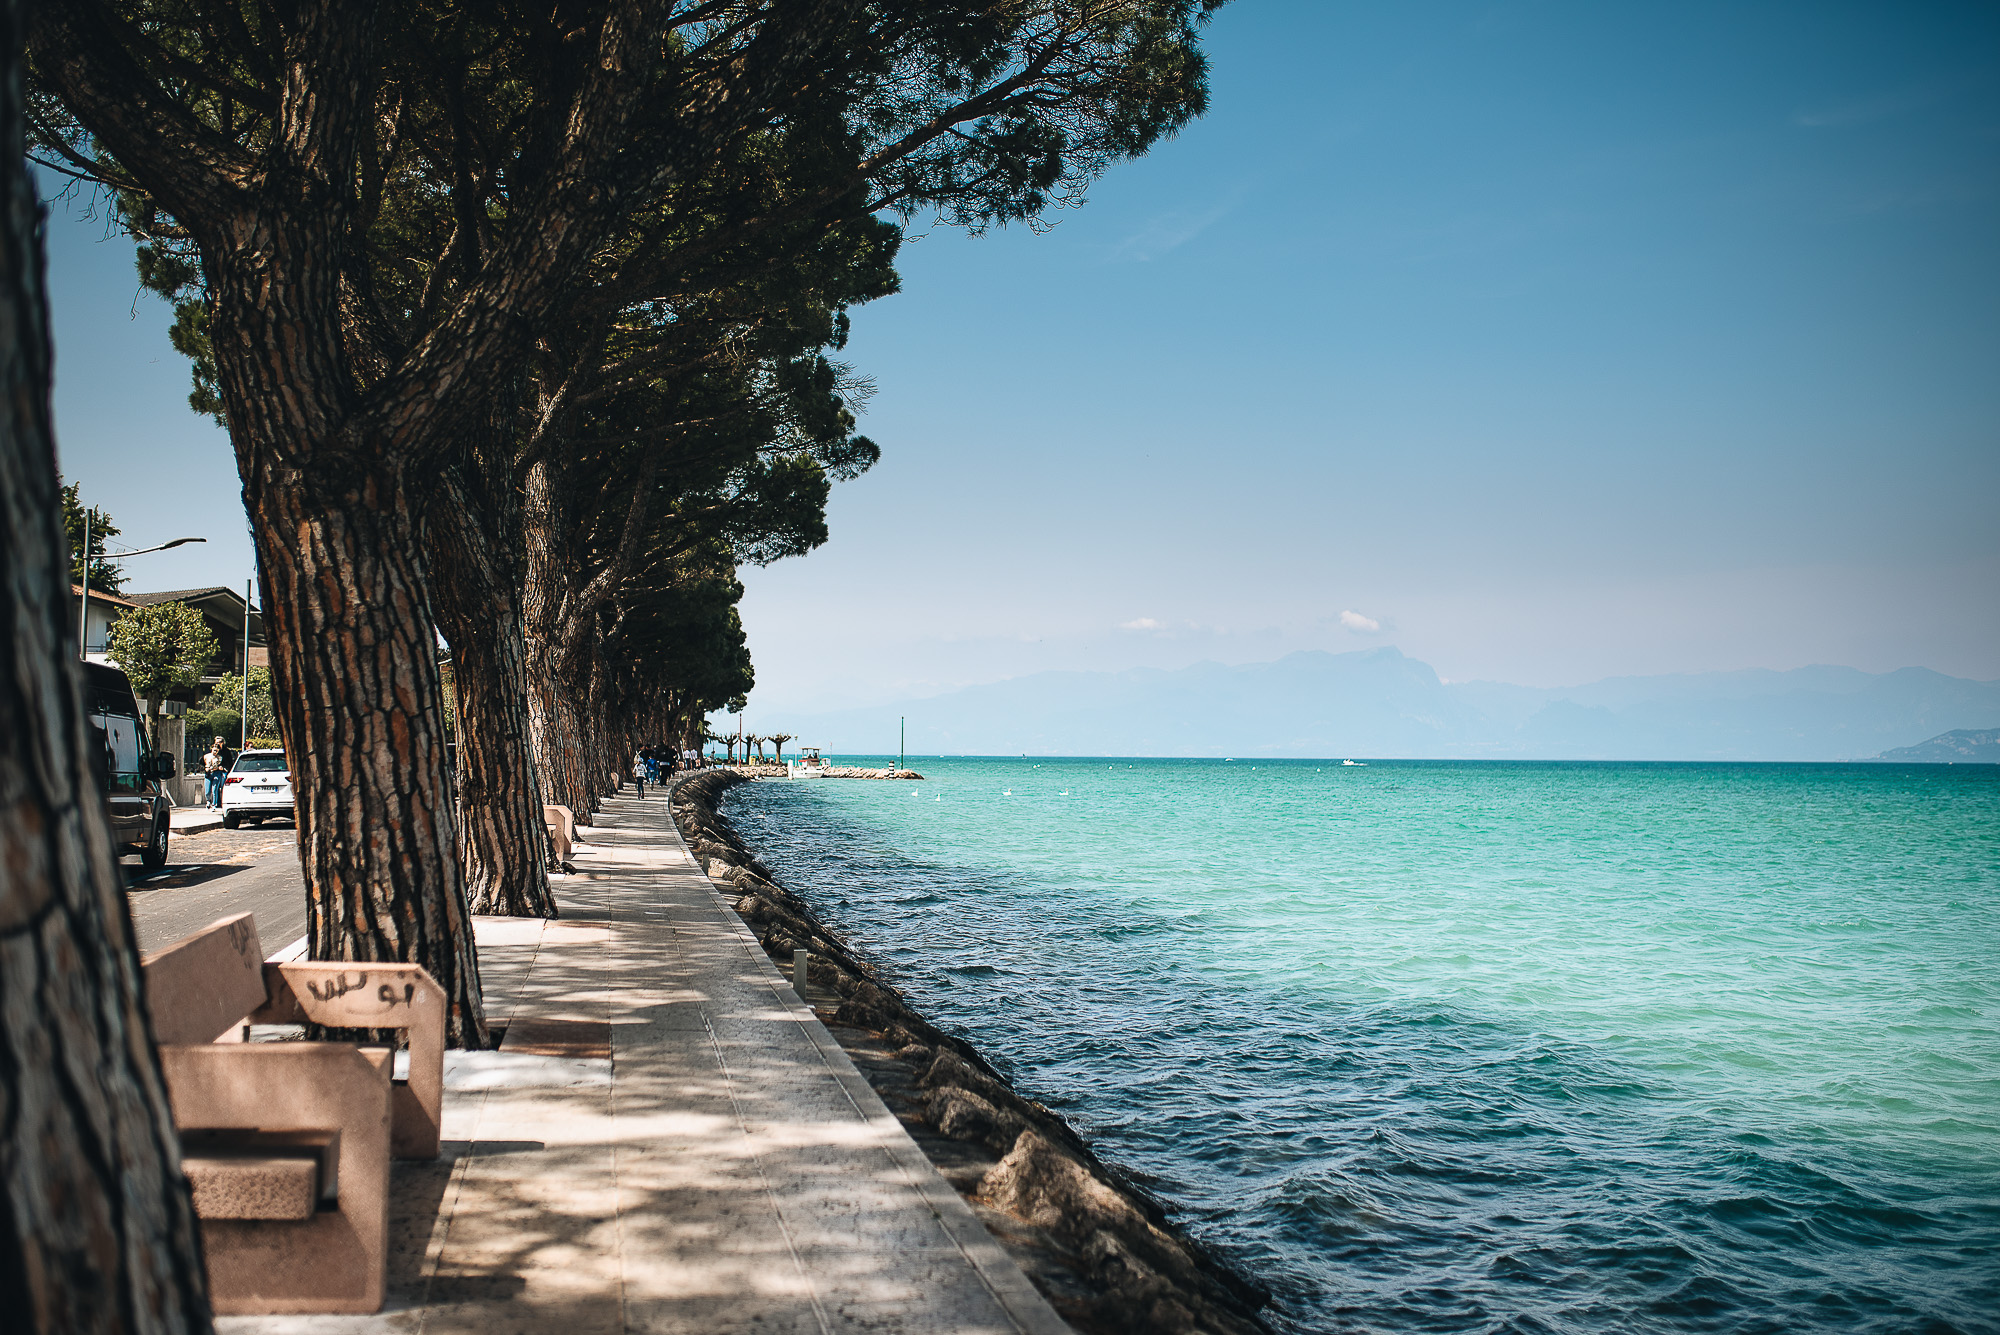 OurBeautifulAdventure-LakeGarda-Italy-Blog-0529.jpg